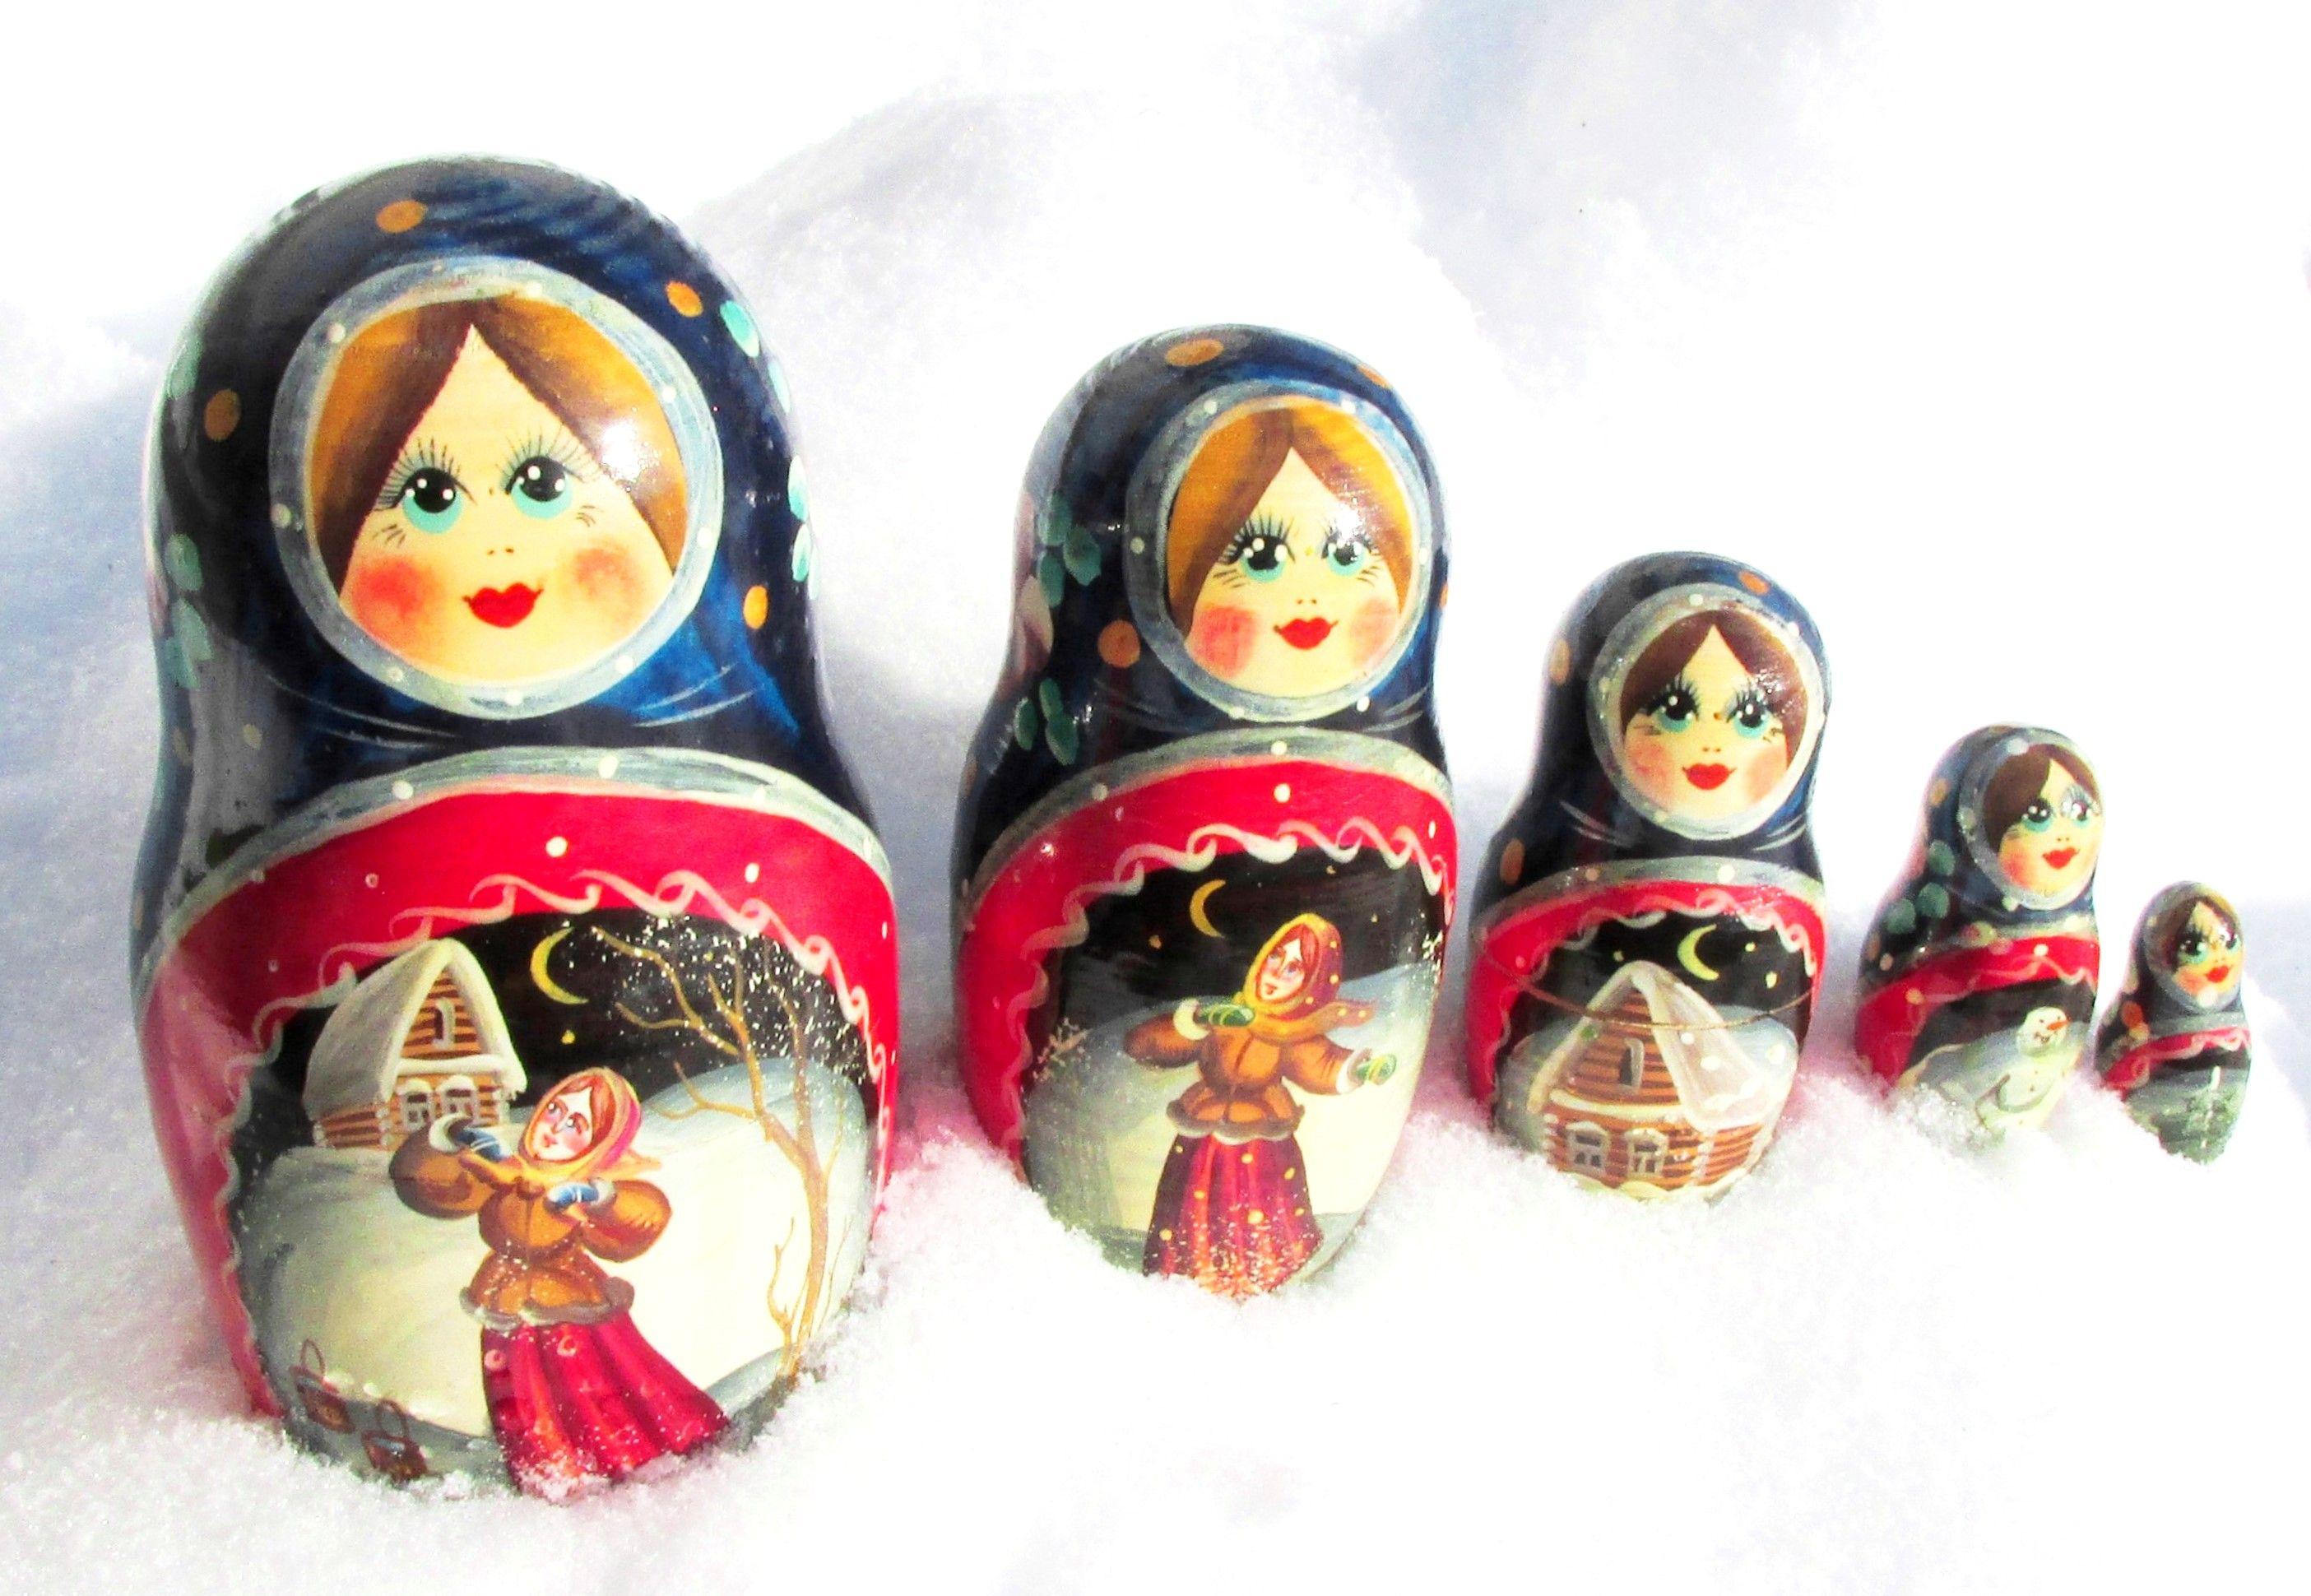 10 PIECES RUSSIAN TRADITIONAL MATRYOSHKA NESTING DOLL CHURCHES POKERWORK 10PCS